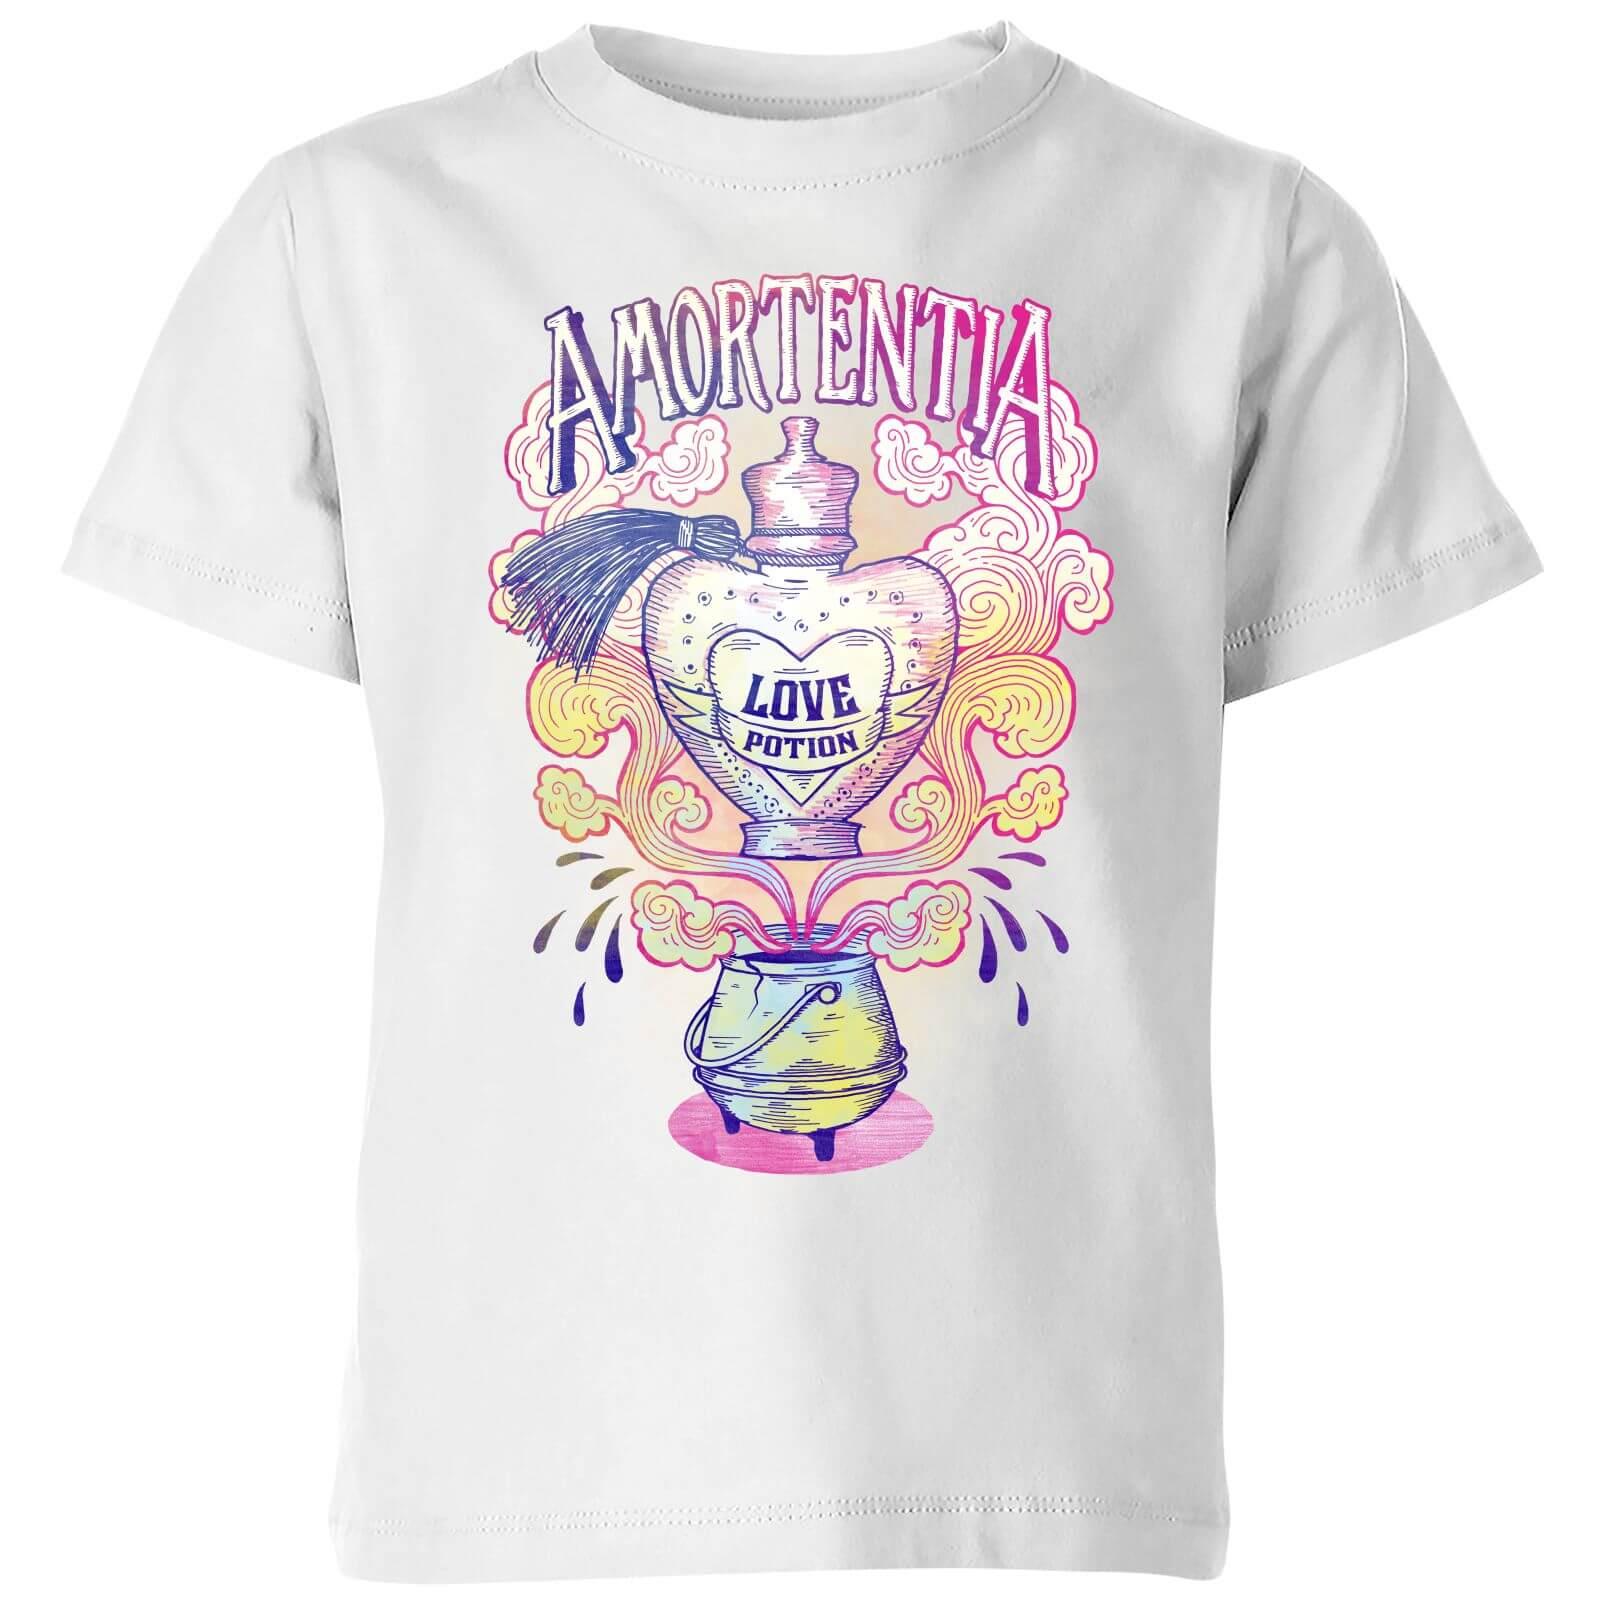 56045a47 Harry Potter Amorentia Love Potion Kids' T-Shirt - White Clothing | Zavvi